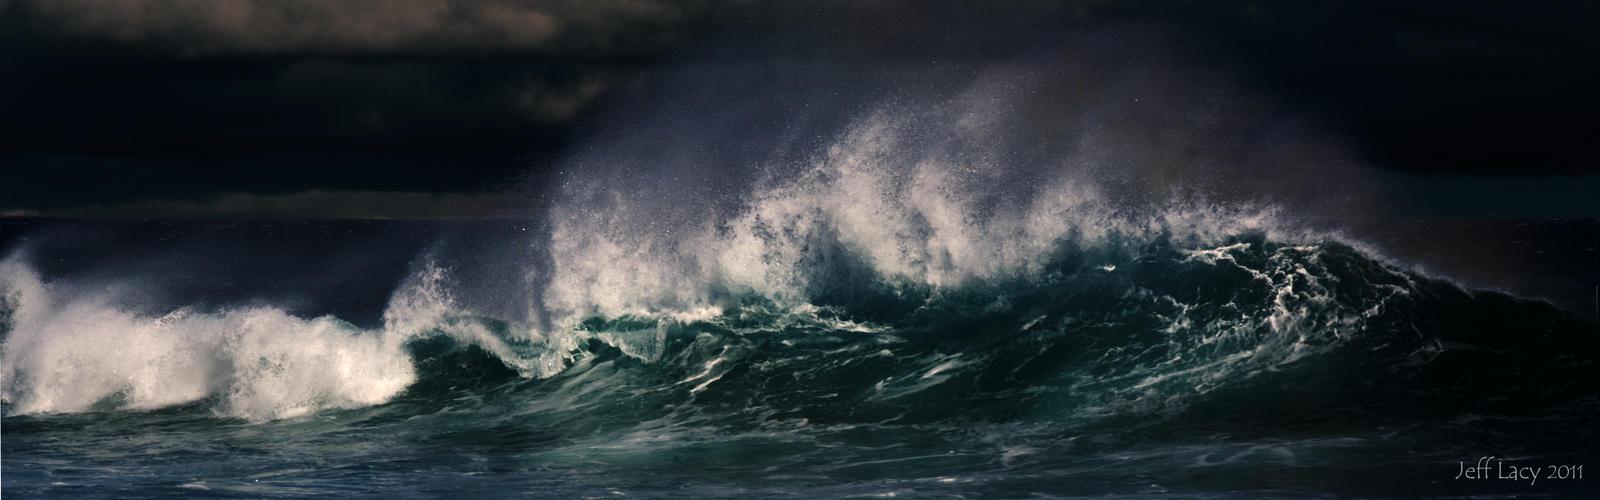 stormy-- dual widescreen wallpaperwetdog969 on deviantart